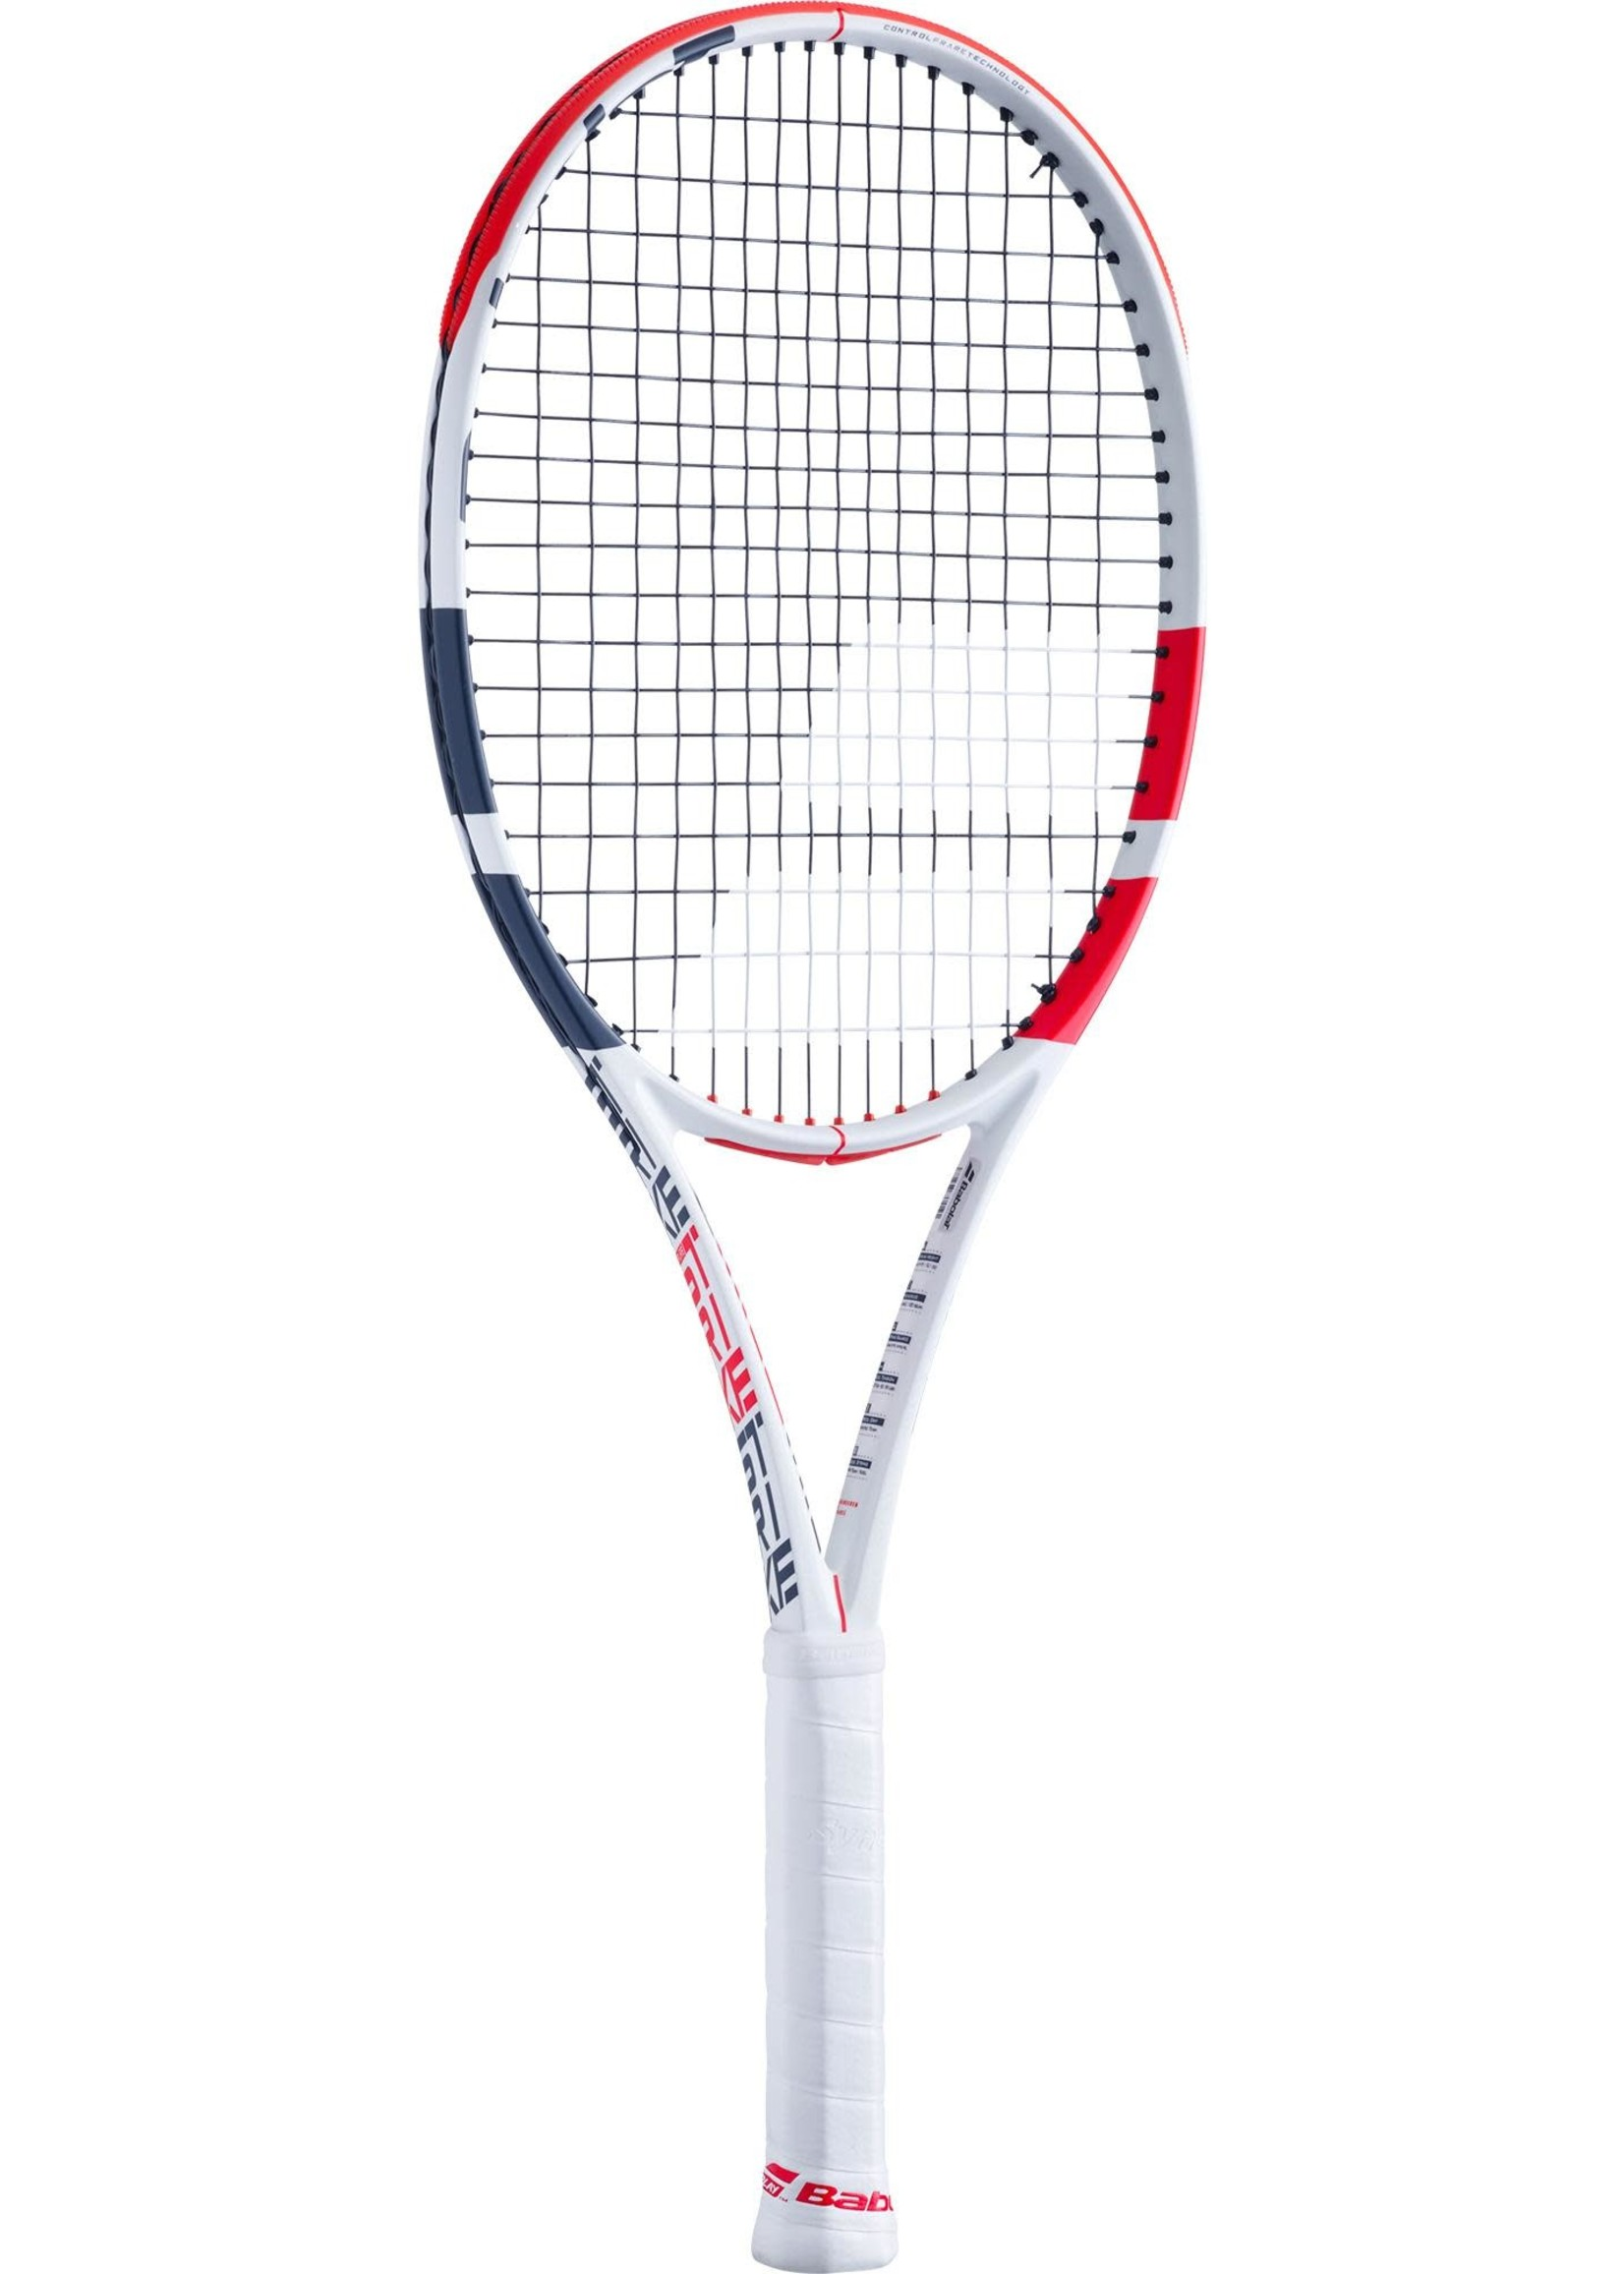 Babolat Babolat Pure Strike Team Tennis Racket (2019)